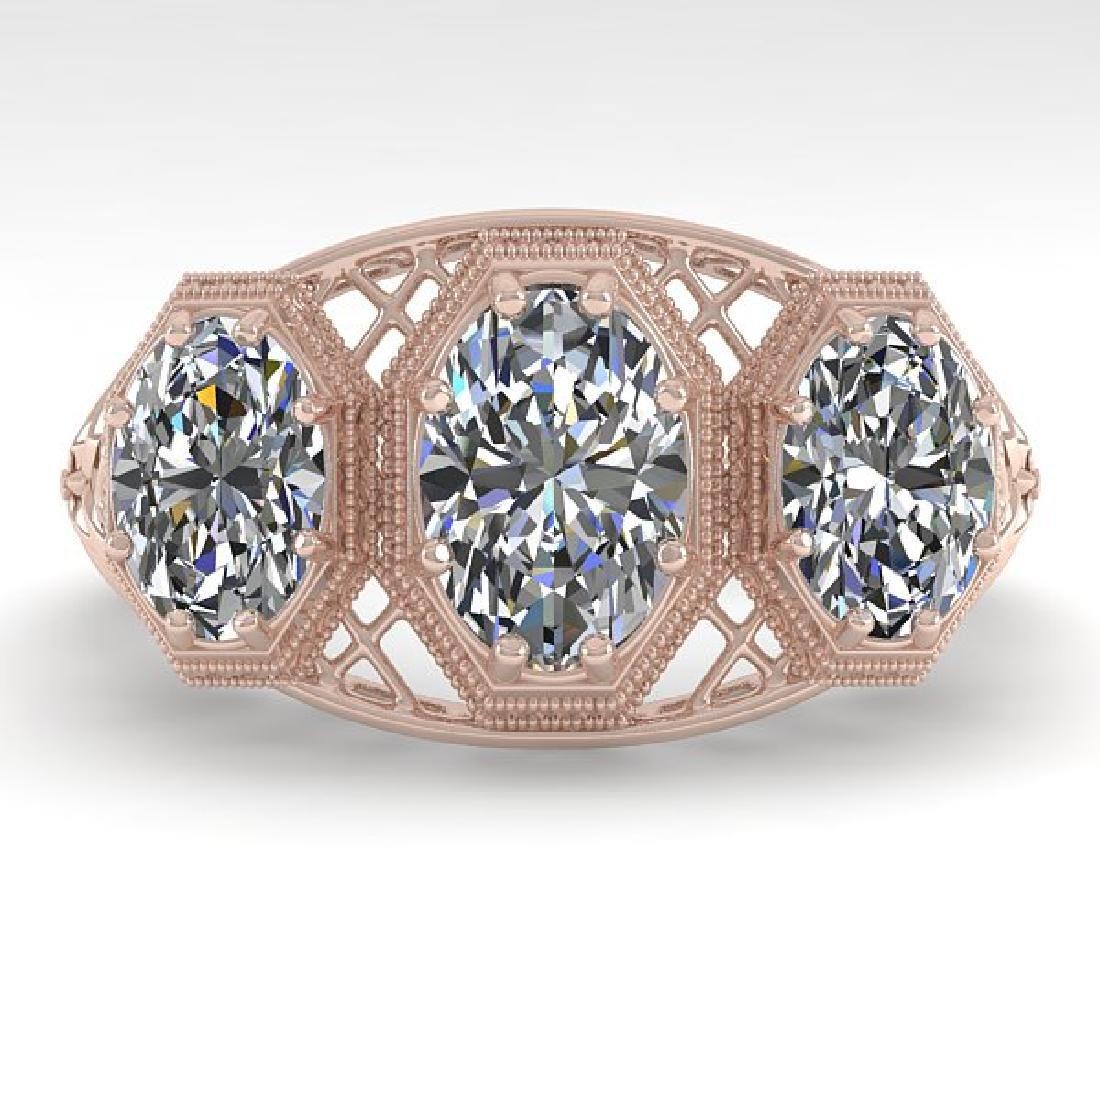 2 CTW VS/SI Oval Cut Diamond Ring 14K Rose Gold